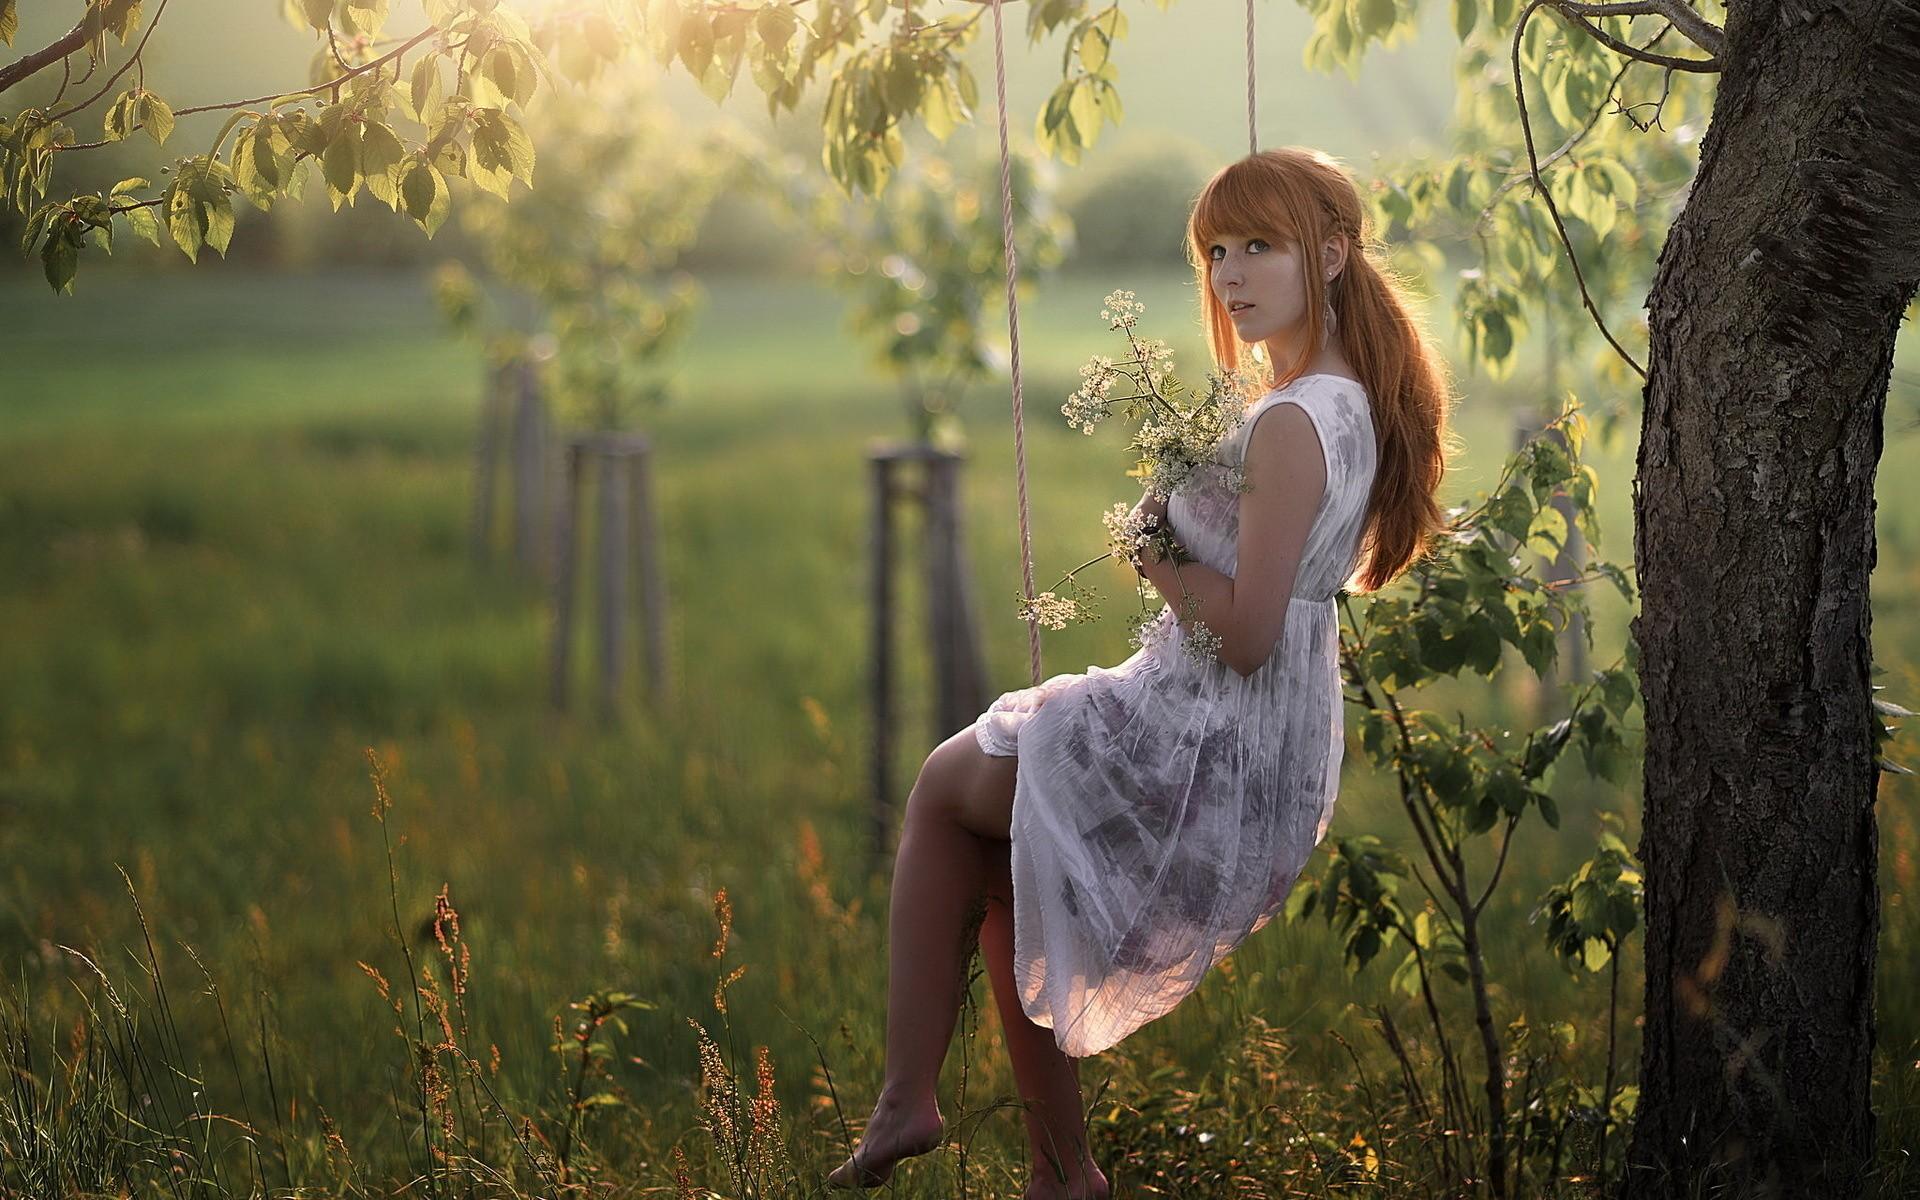 Wallpaper : sunlight, forest, leaves, women outdoors